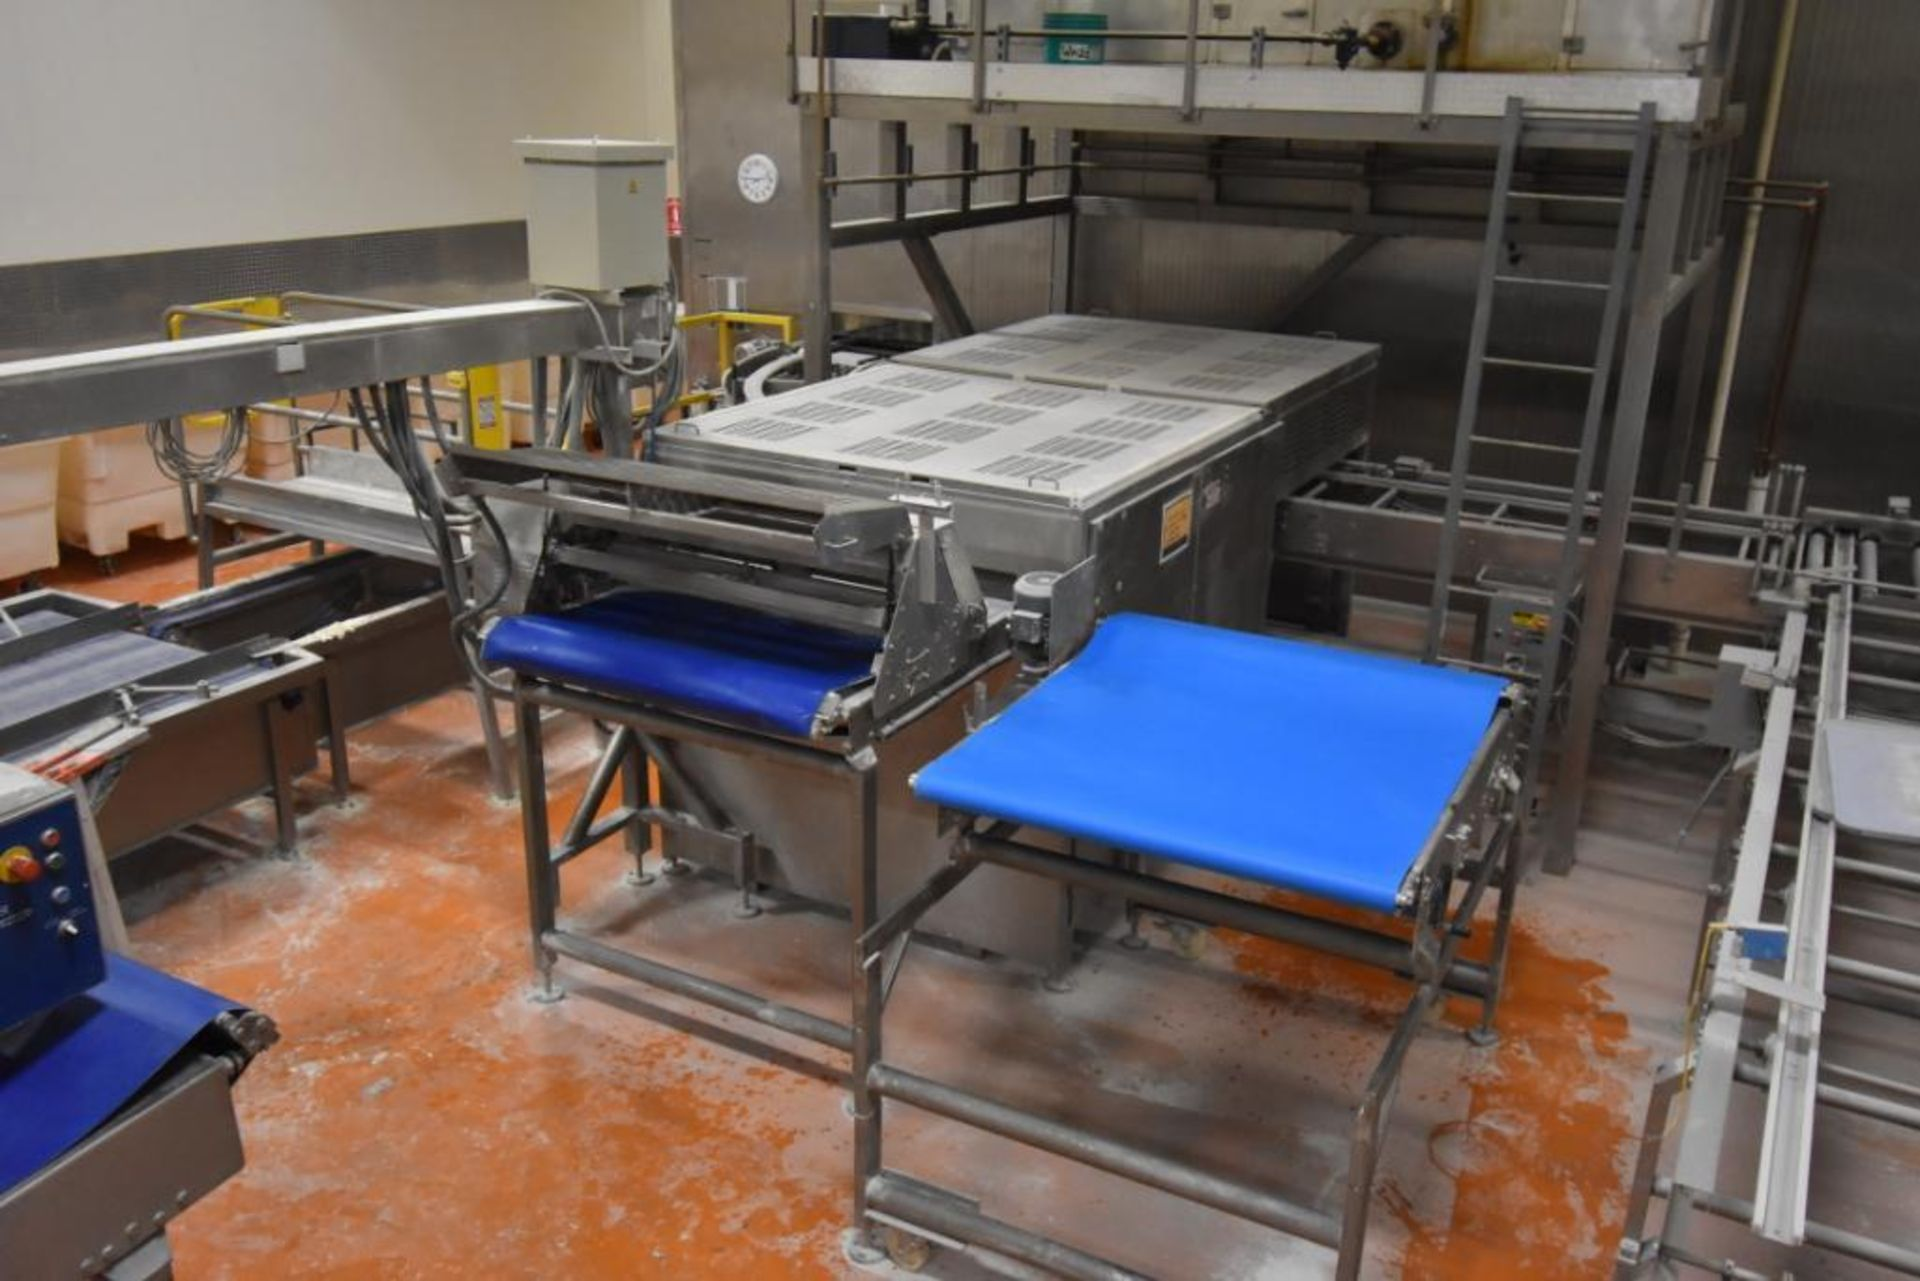 2007 Fritsch Laminator 3000 dough line - Image 246 of 280